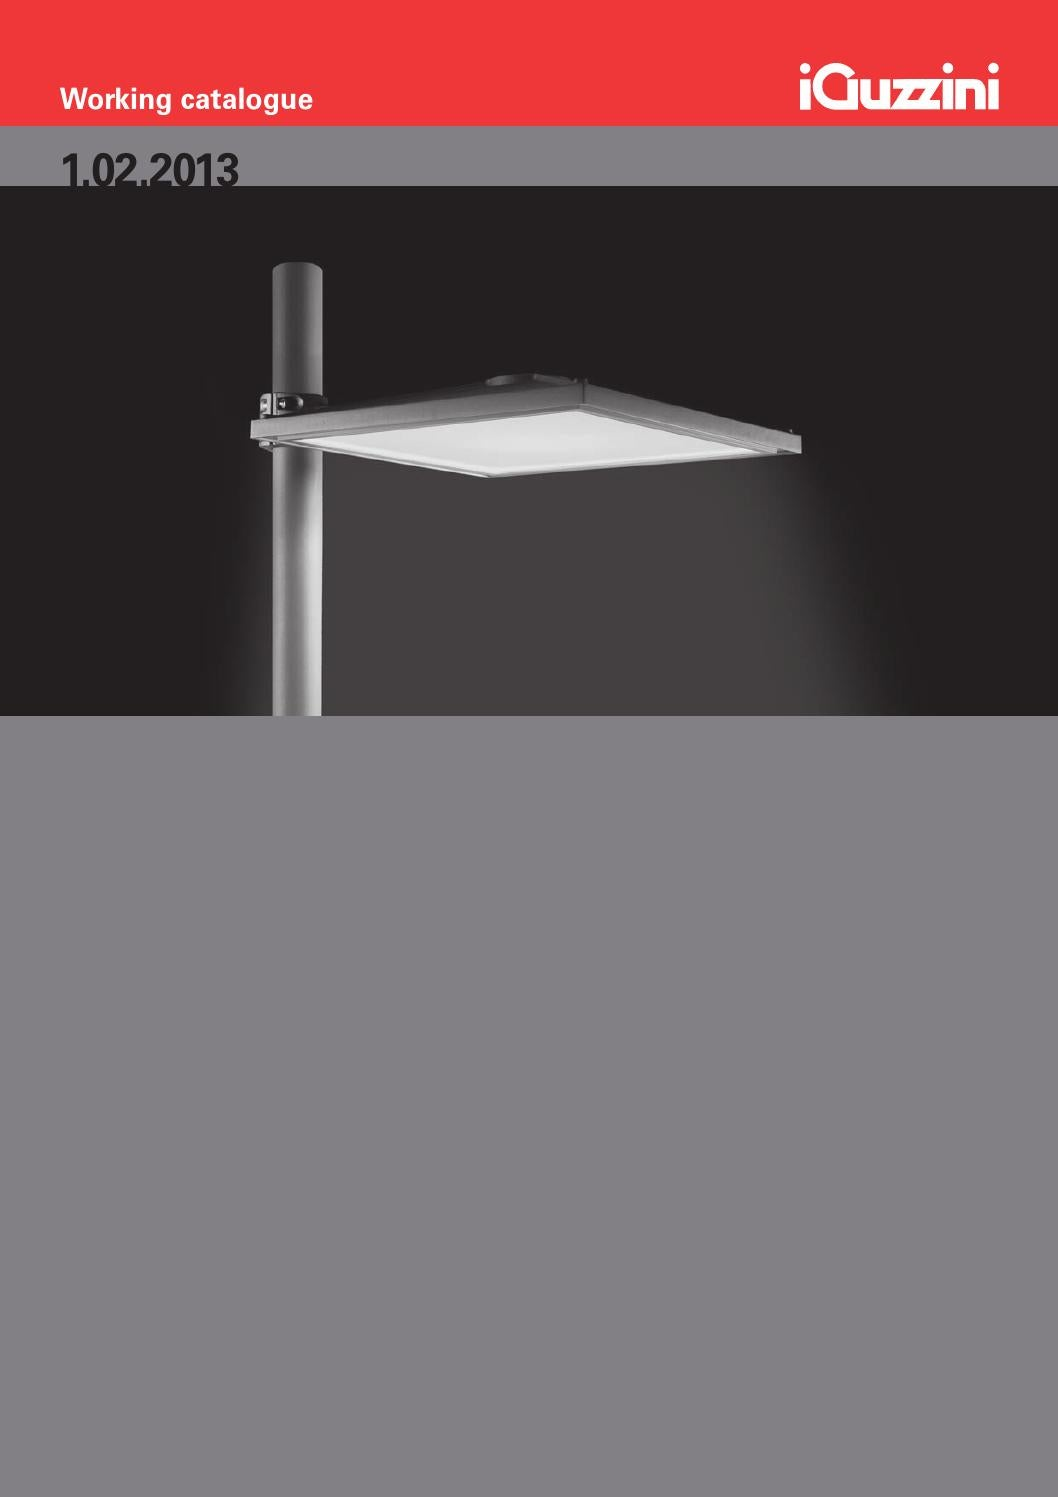 issuu iguzzini 2013 working catalogue by bellatrix bellatrix. Black Bedroom Furniture Sets. Home Design Ideas